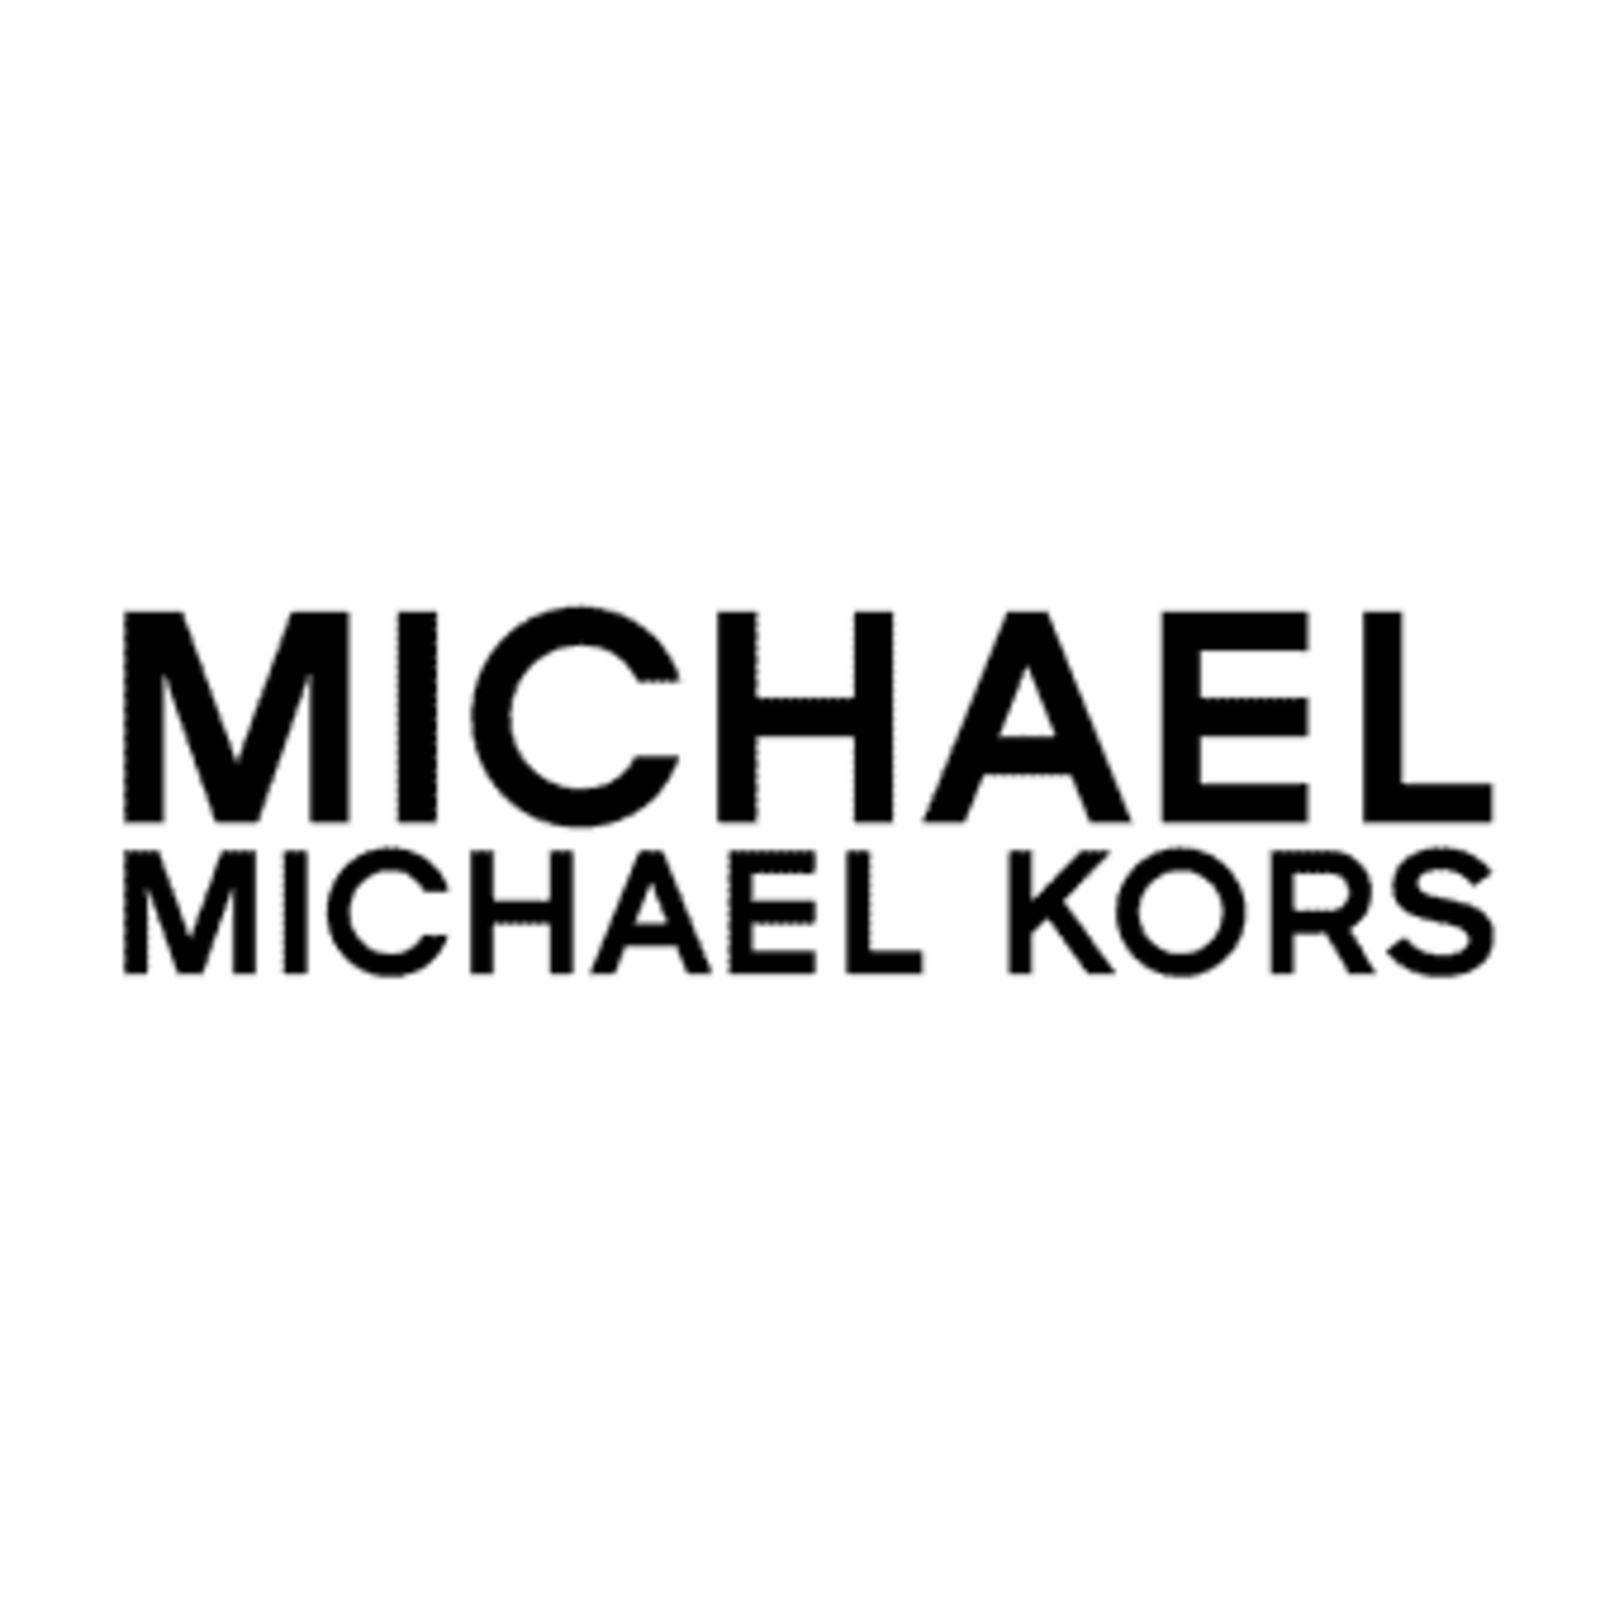 MICHAEL MICHAEL KORS (Bild 1)